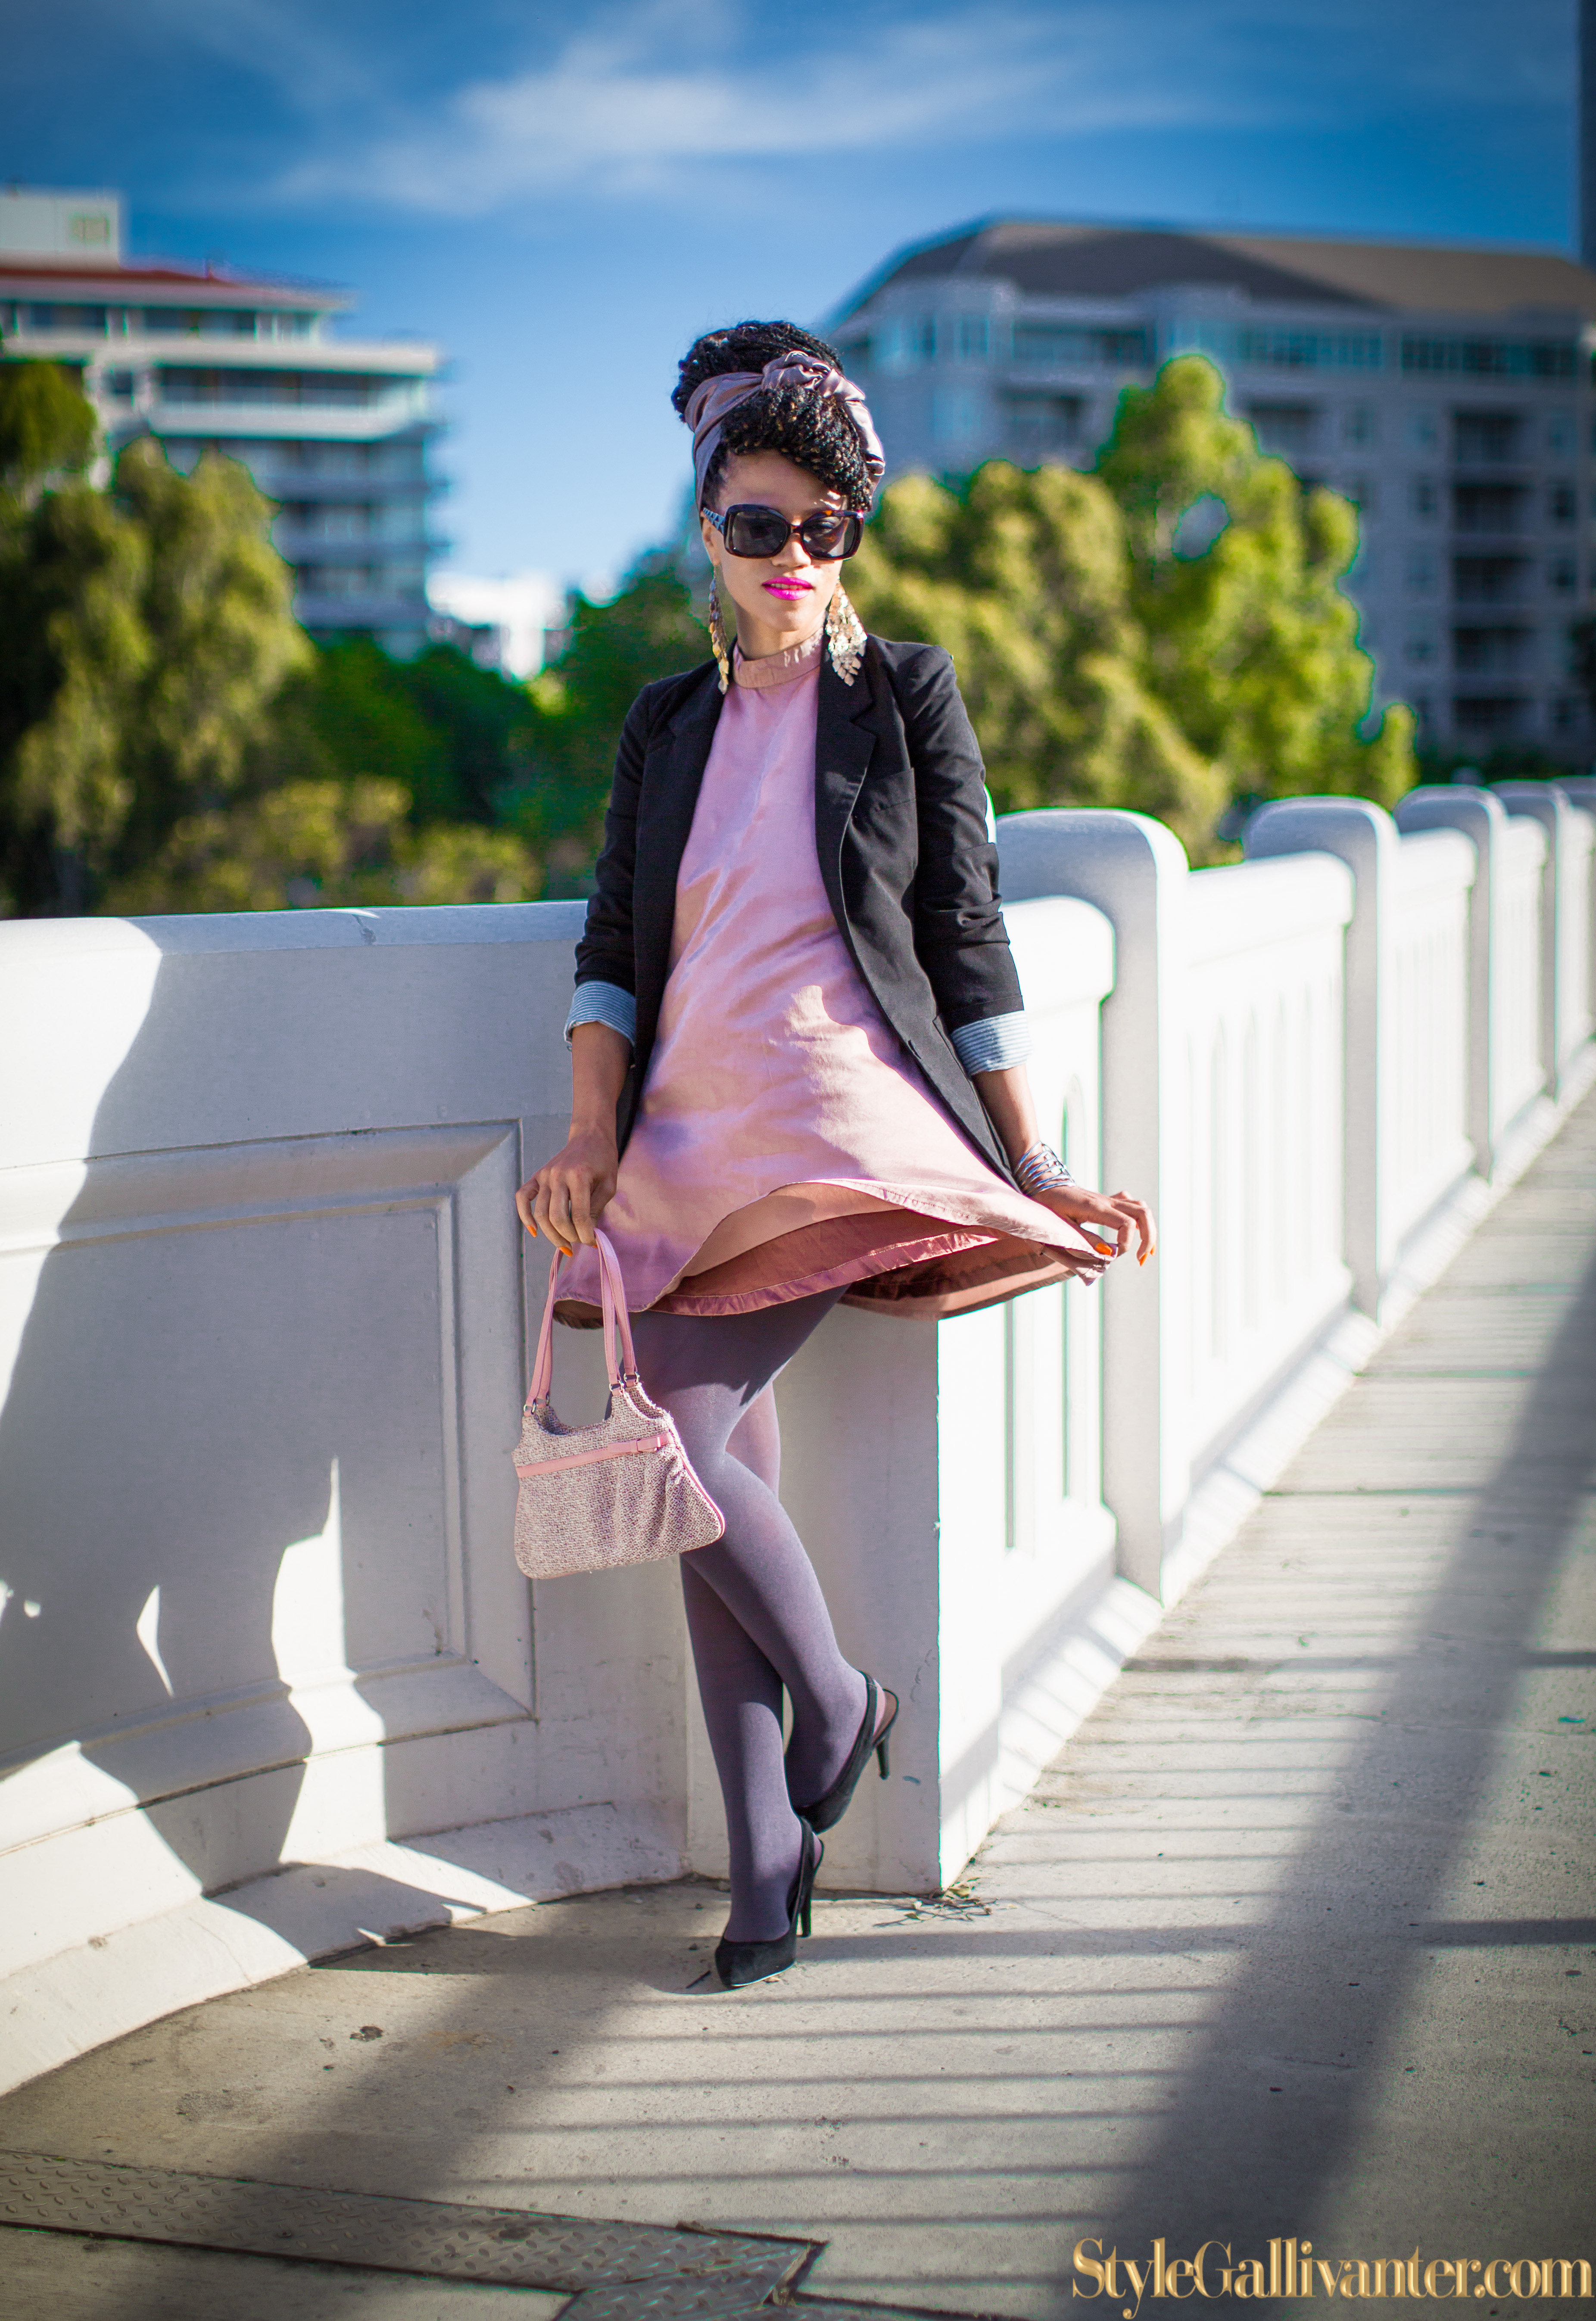 stylish-turbans-melbourne_turban-trend-2014_melbourne's-best-fashion-bloggers_fashion-vips-melbourne_relevant-bloggers-melbourne_unique-fashion-bloggers-melbourne_best-fashion-blog-melbourne-australia_box-braids-2014_melbourne-2014_easy-box-braids-styles